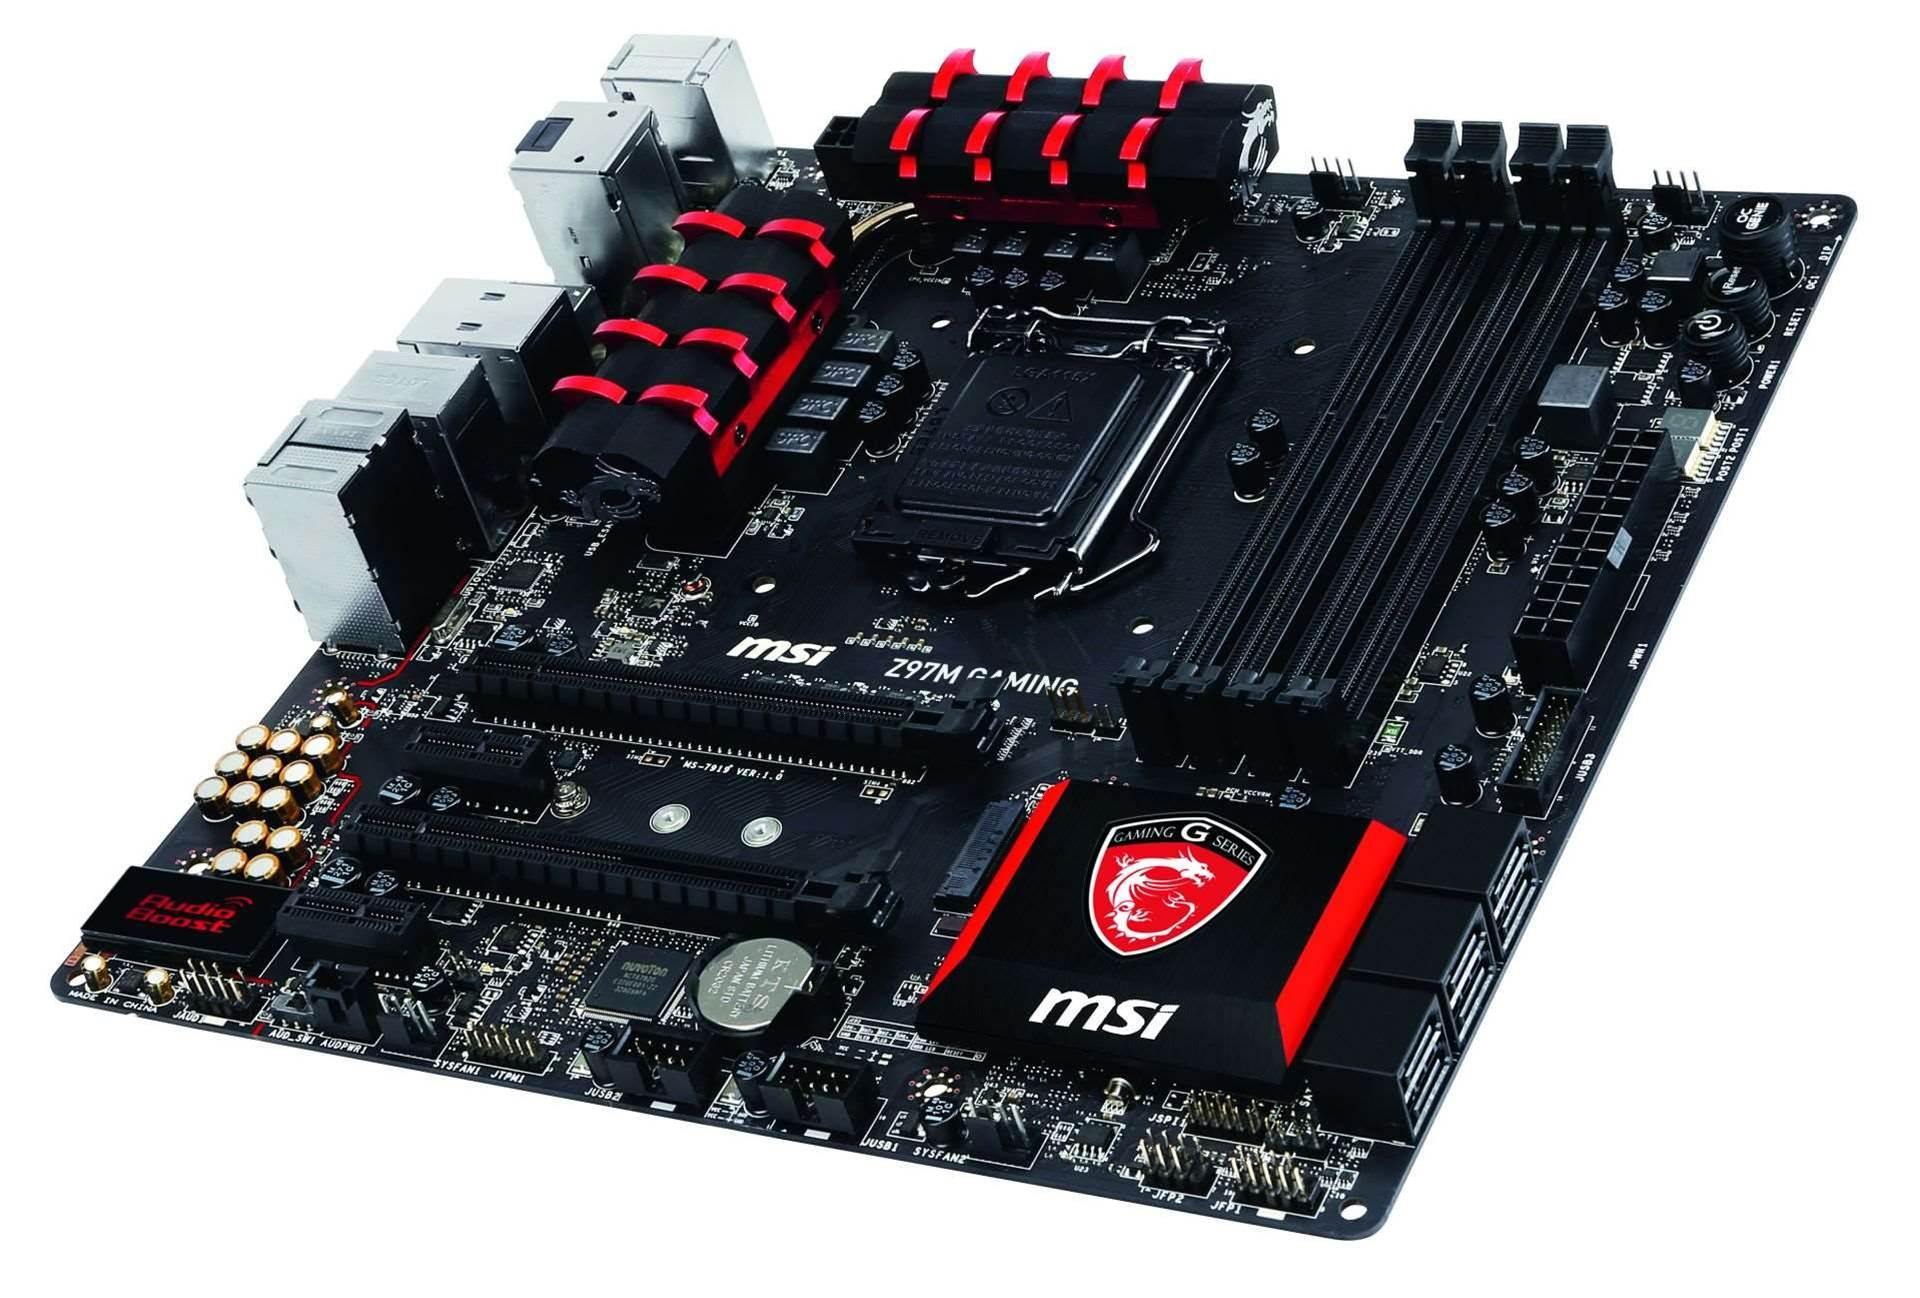 Review: MSI Z97M Gaming